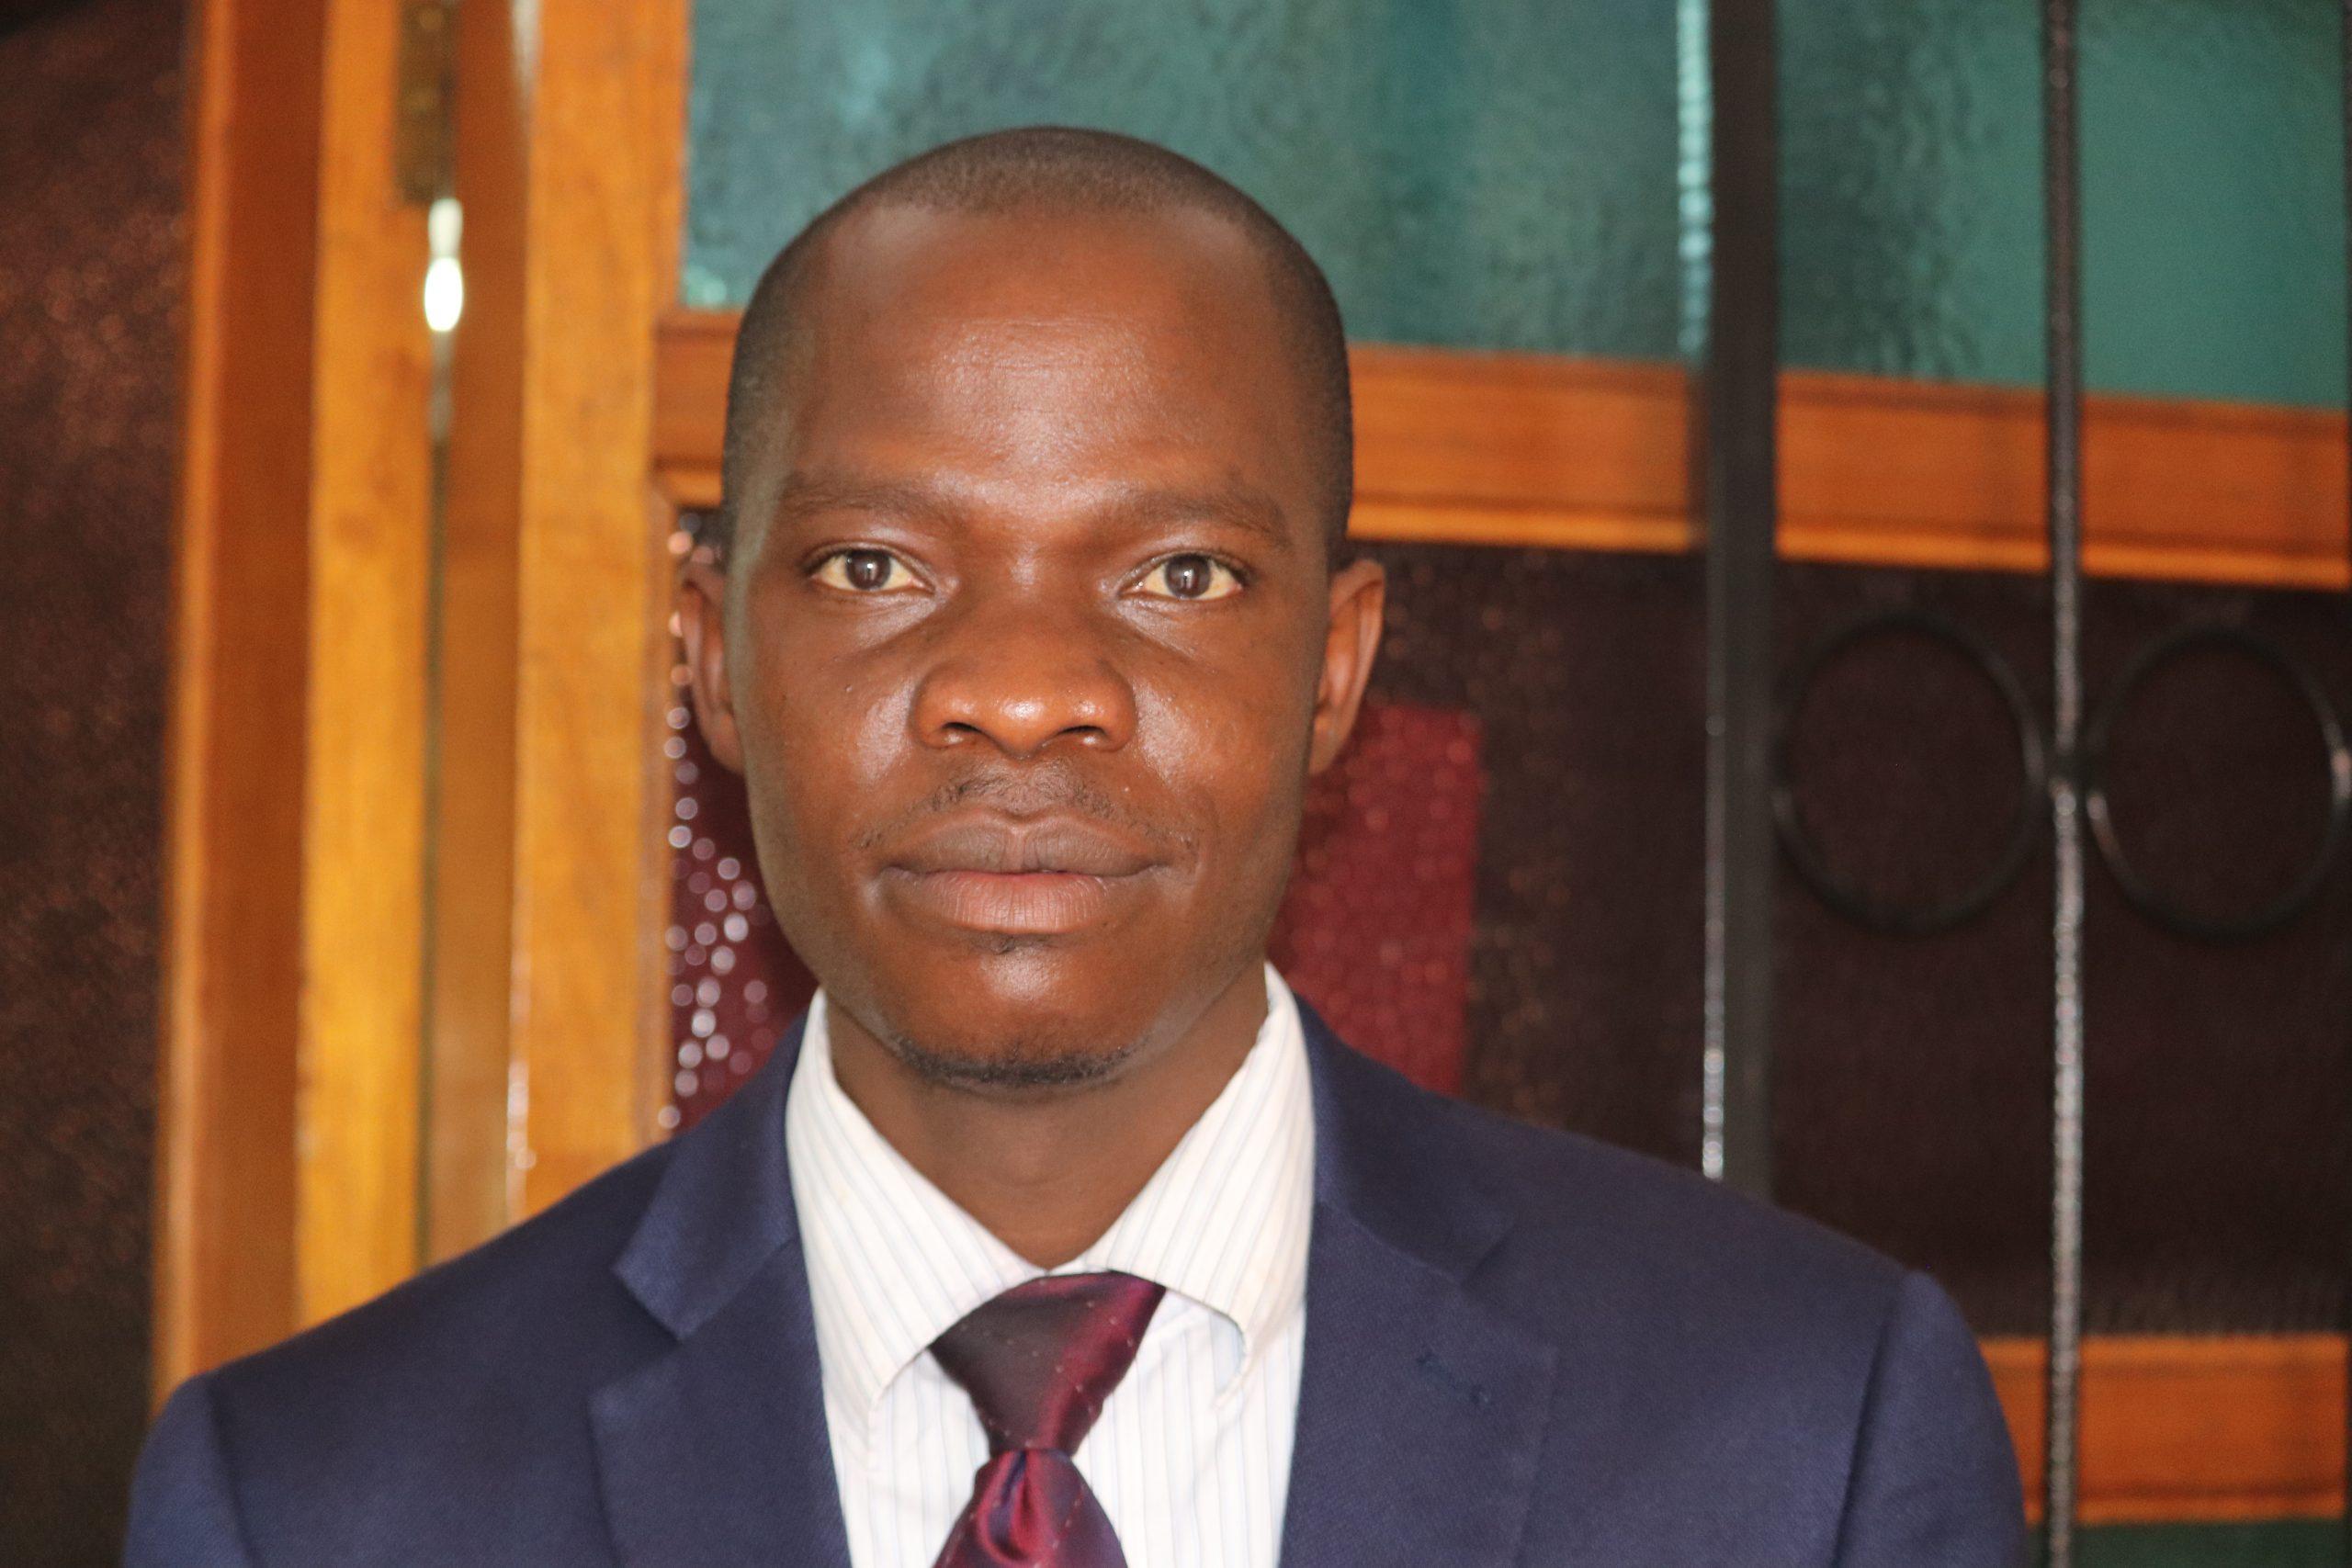 Mr. Mwiba Mwenda